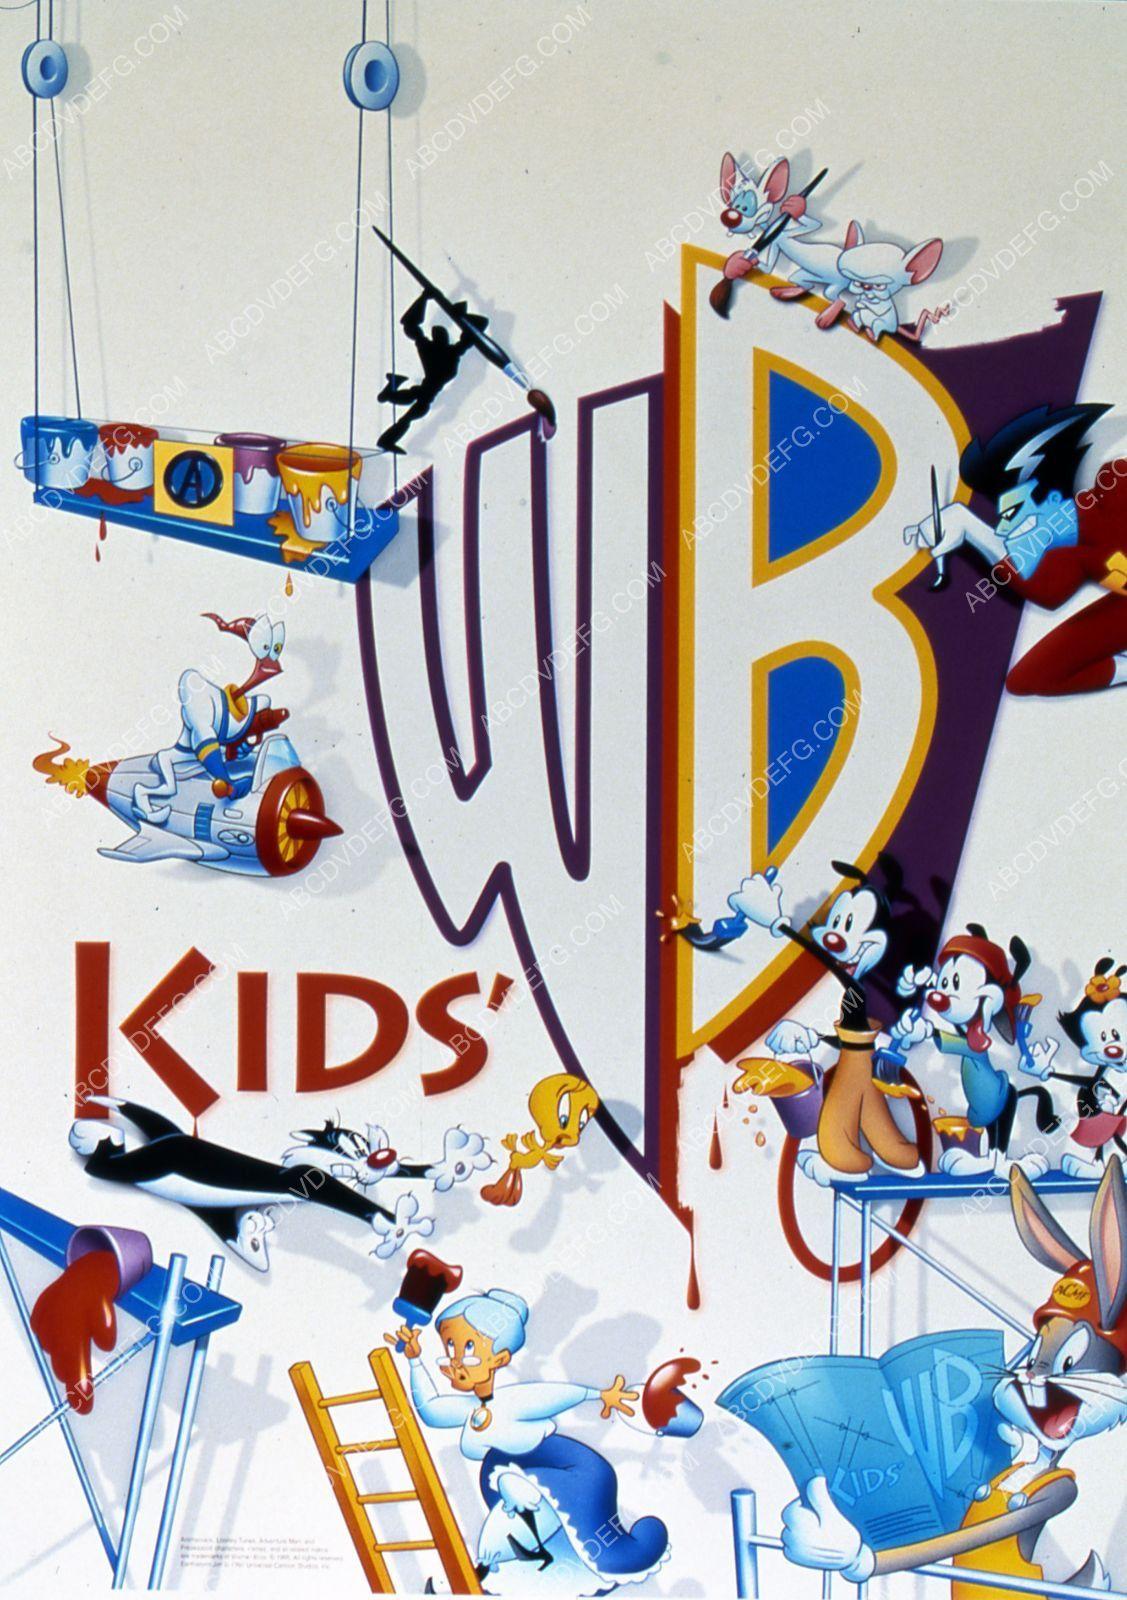 Animation Promo TV Kids WB Network 35m 6691